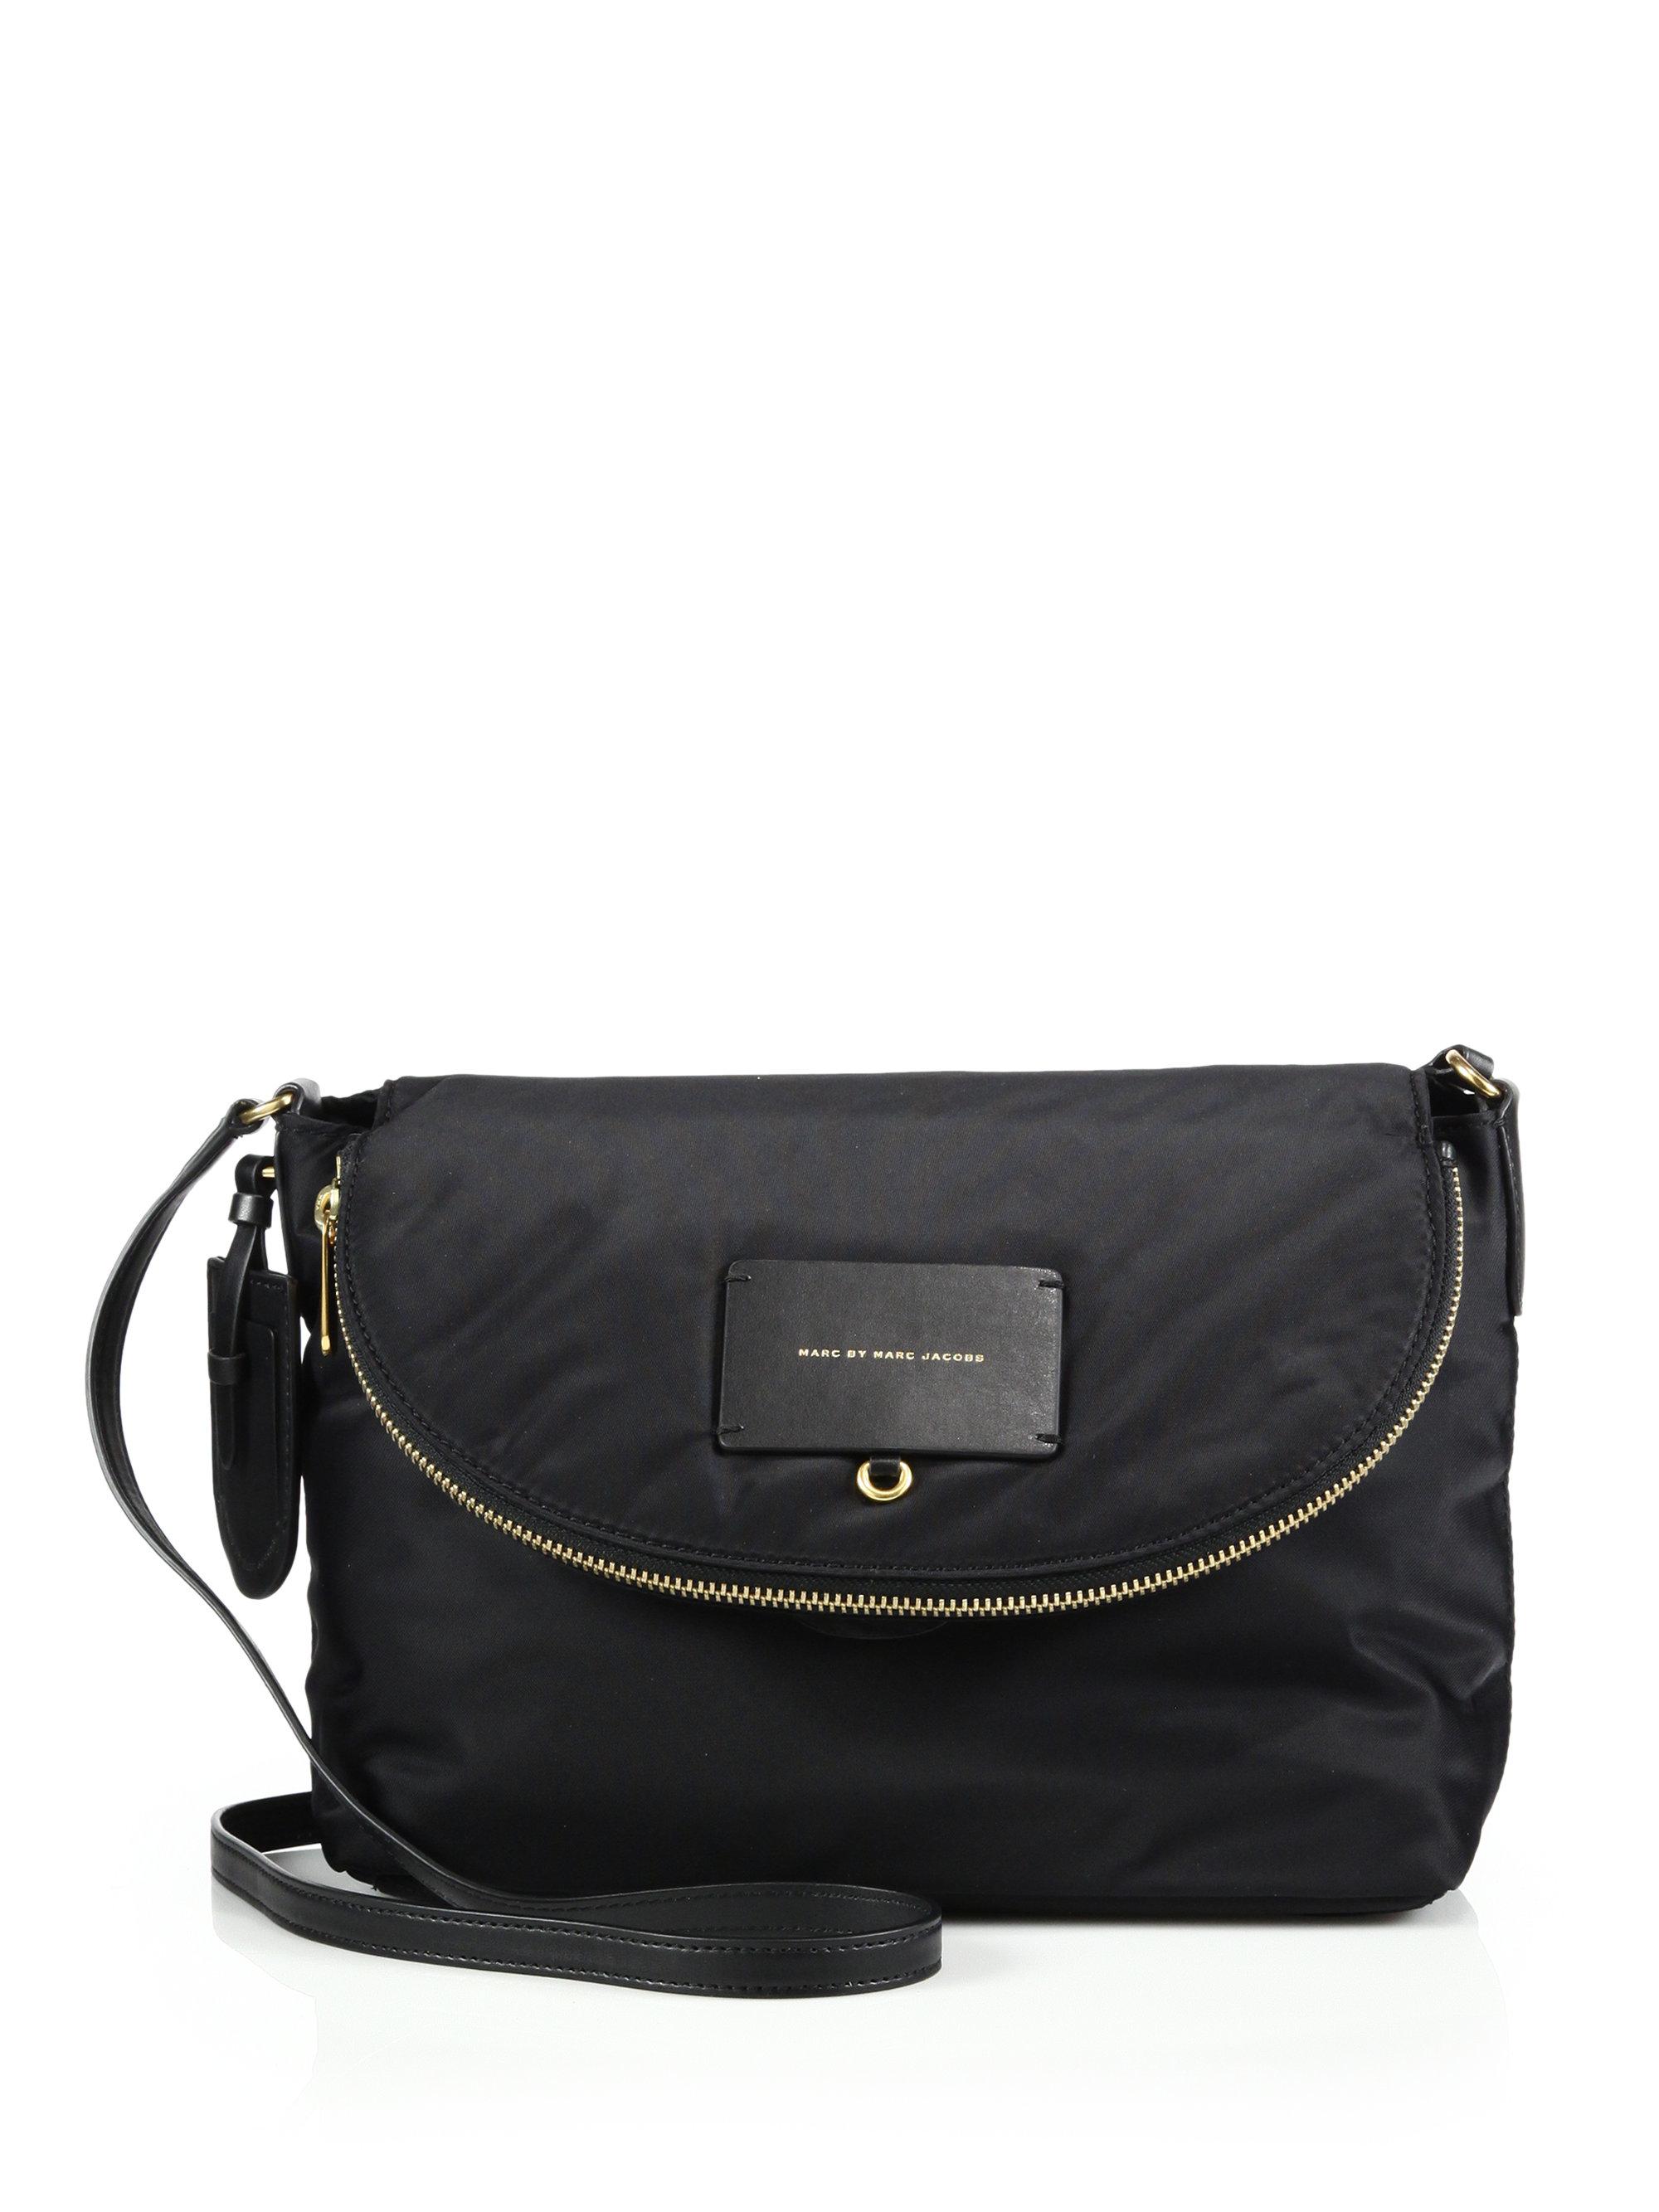 Marc by marc jacobs Natasha Nylon Crossbody Bag in Black ...